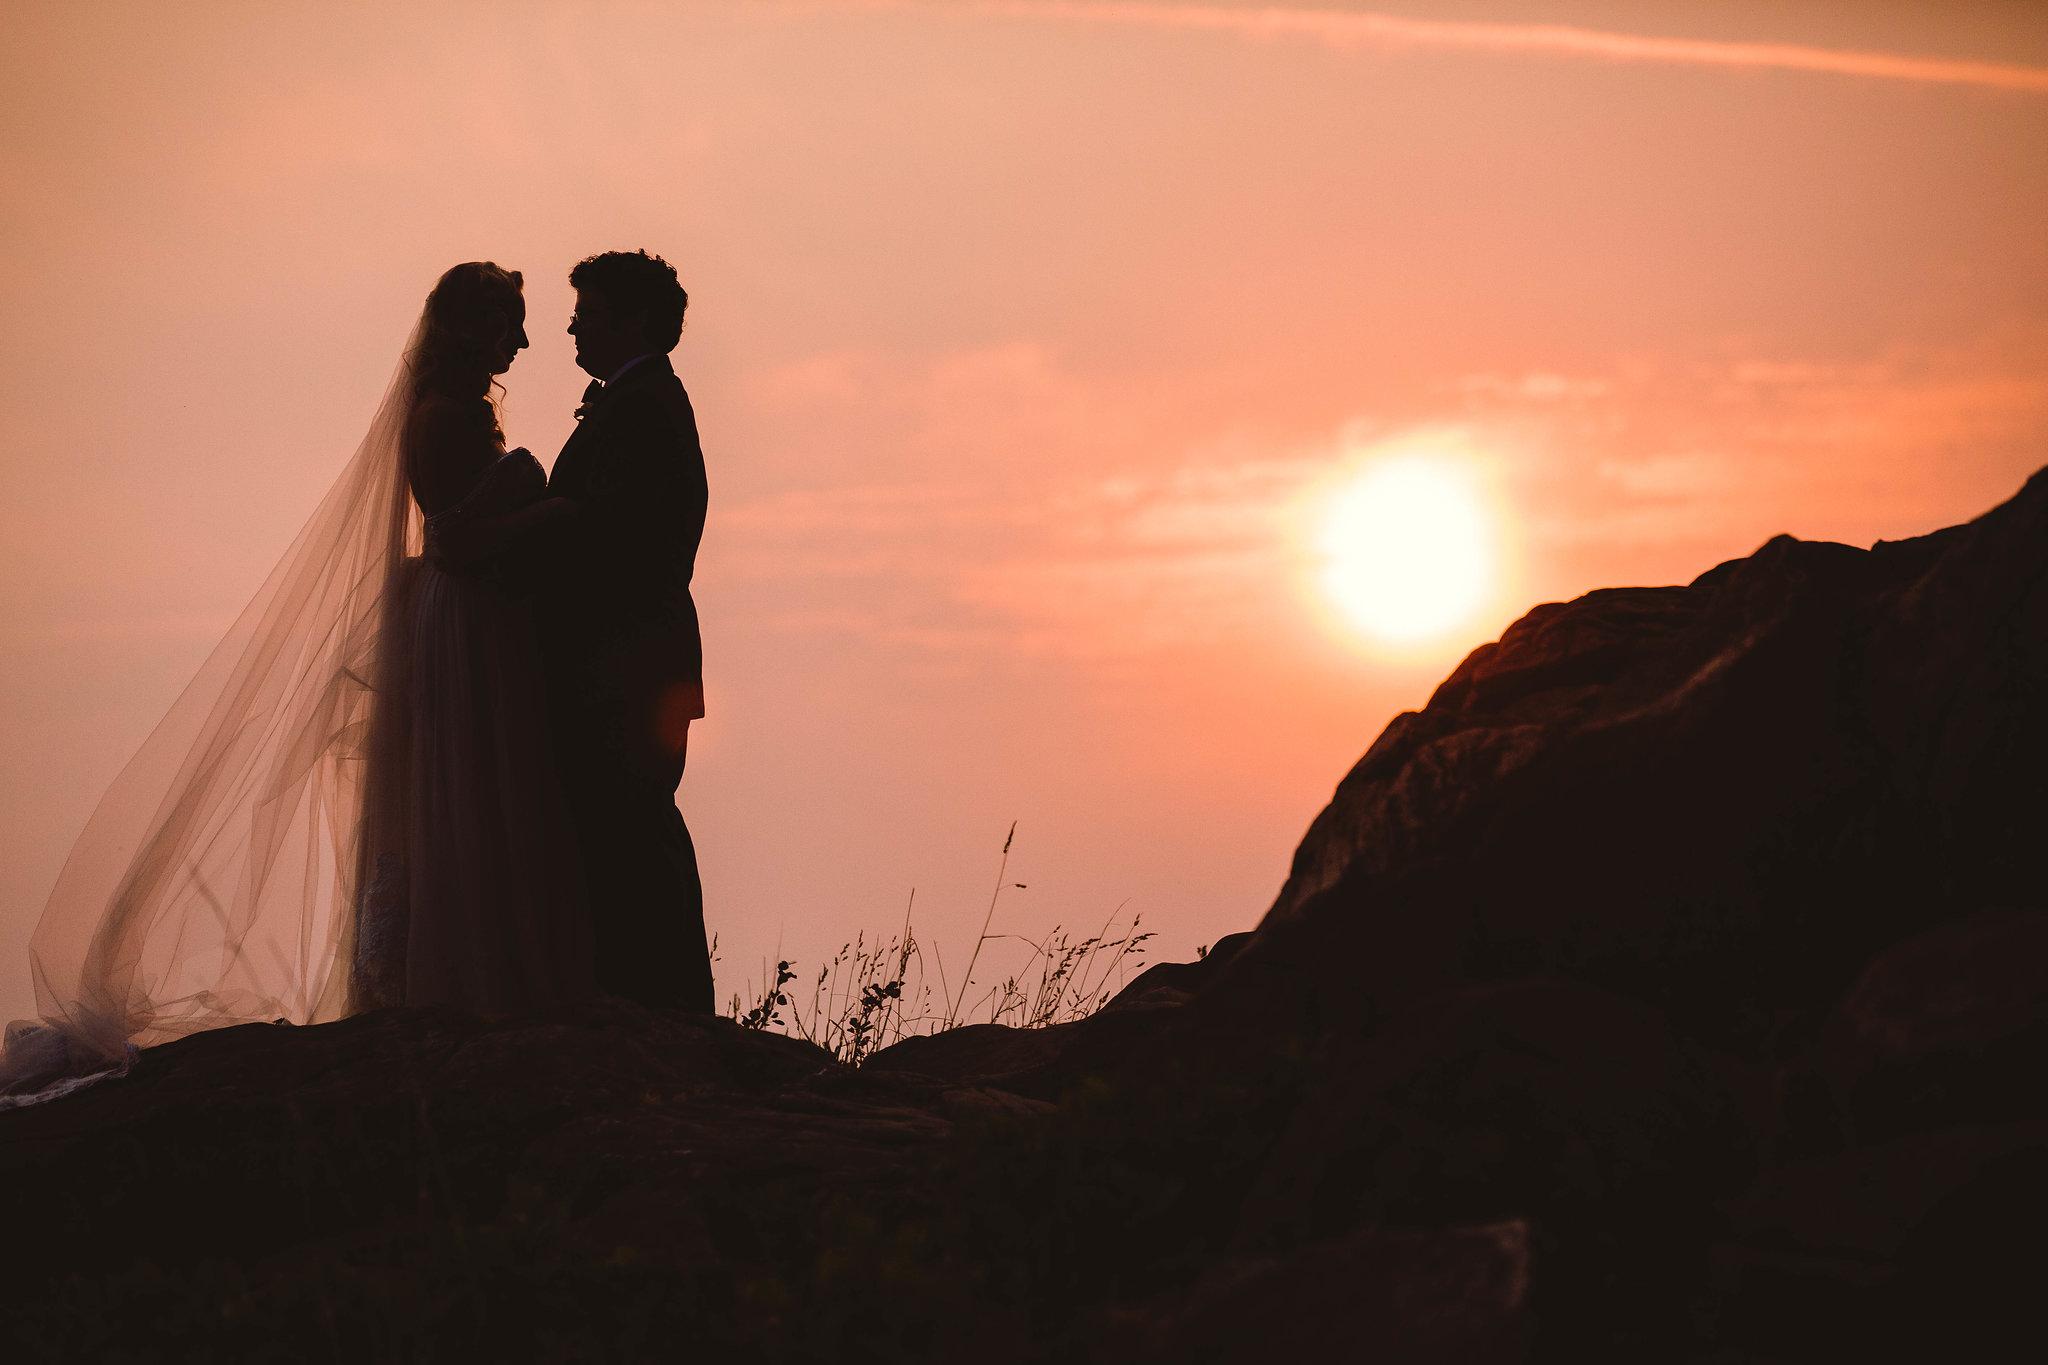 bellingham-wedding-backayard-by-seattle-wedding-photographer-adina-preston-34.jpg